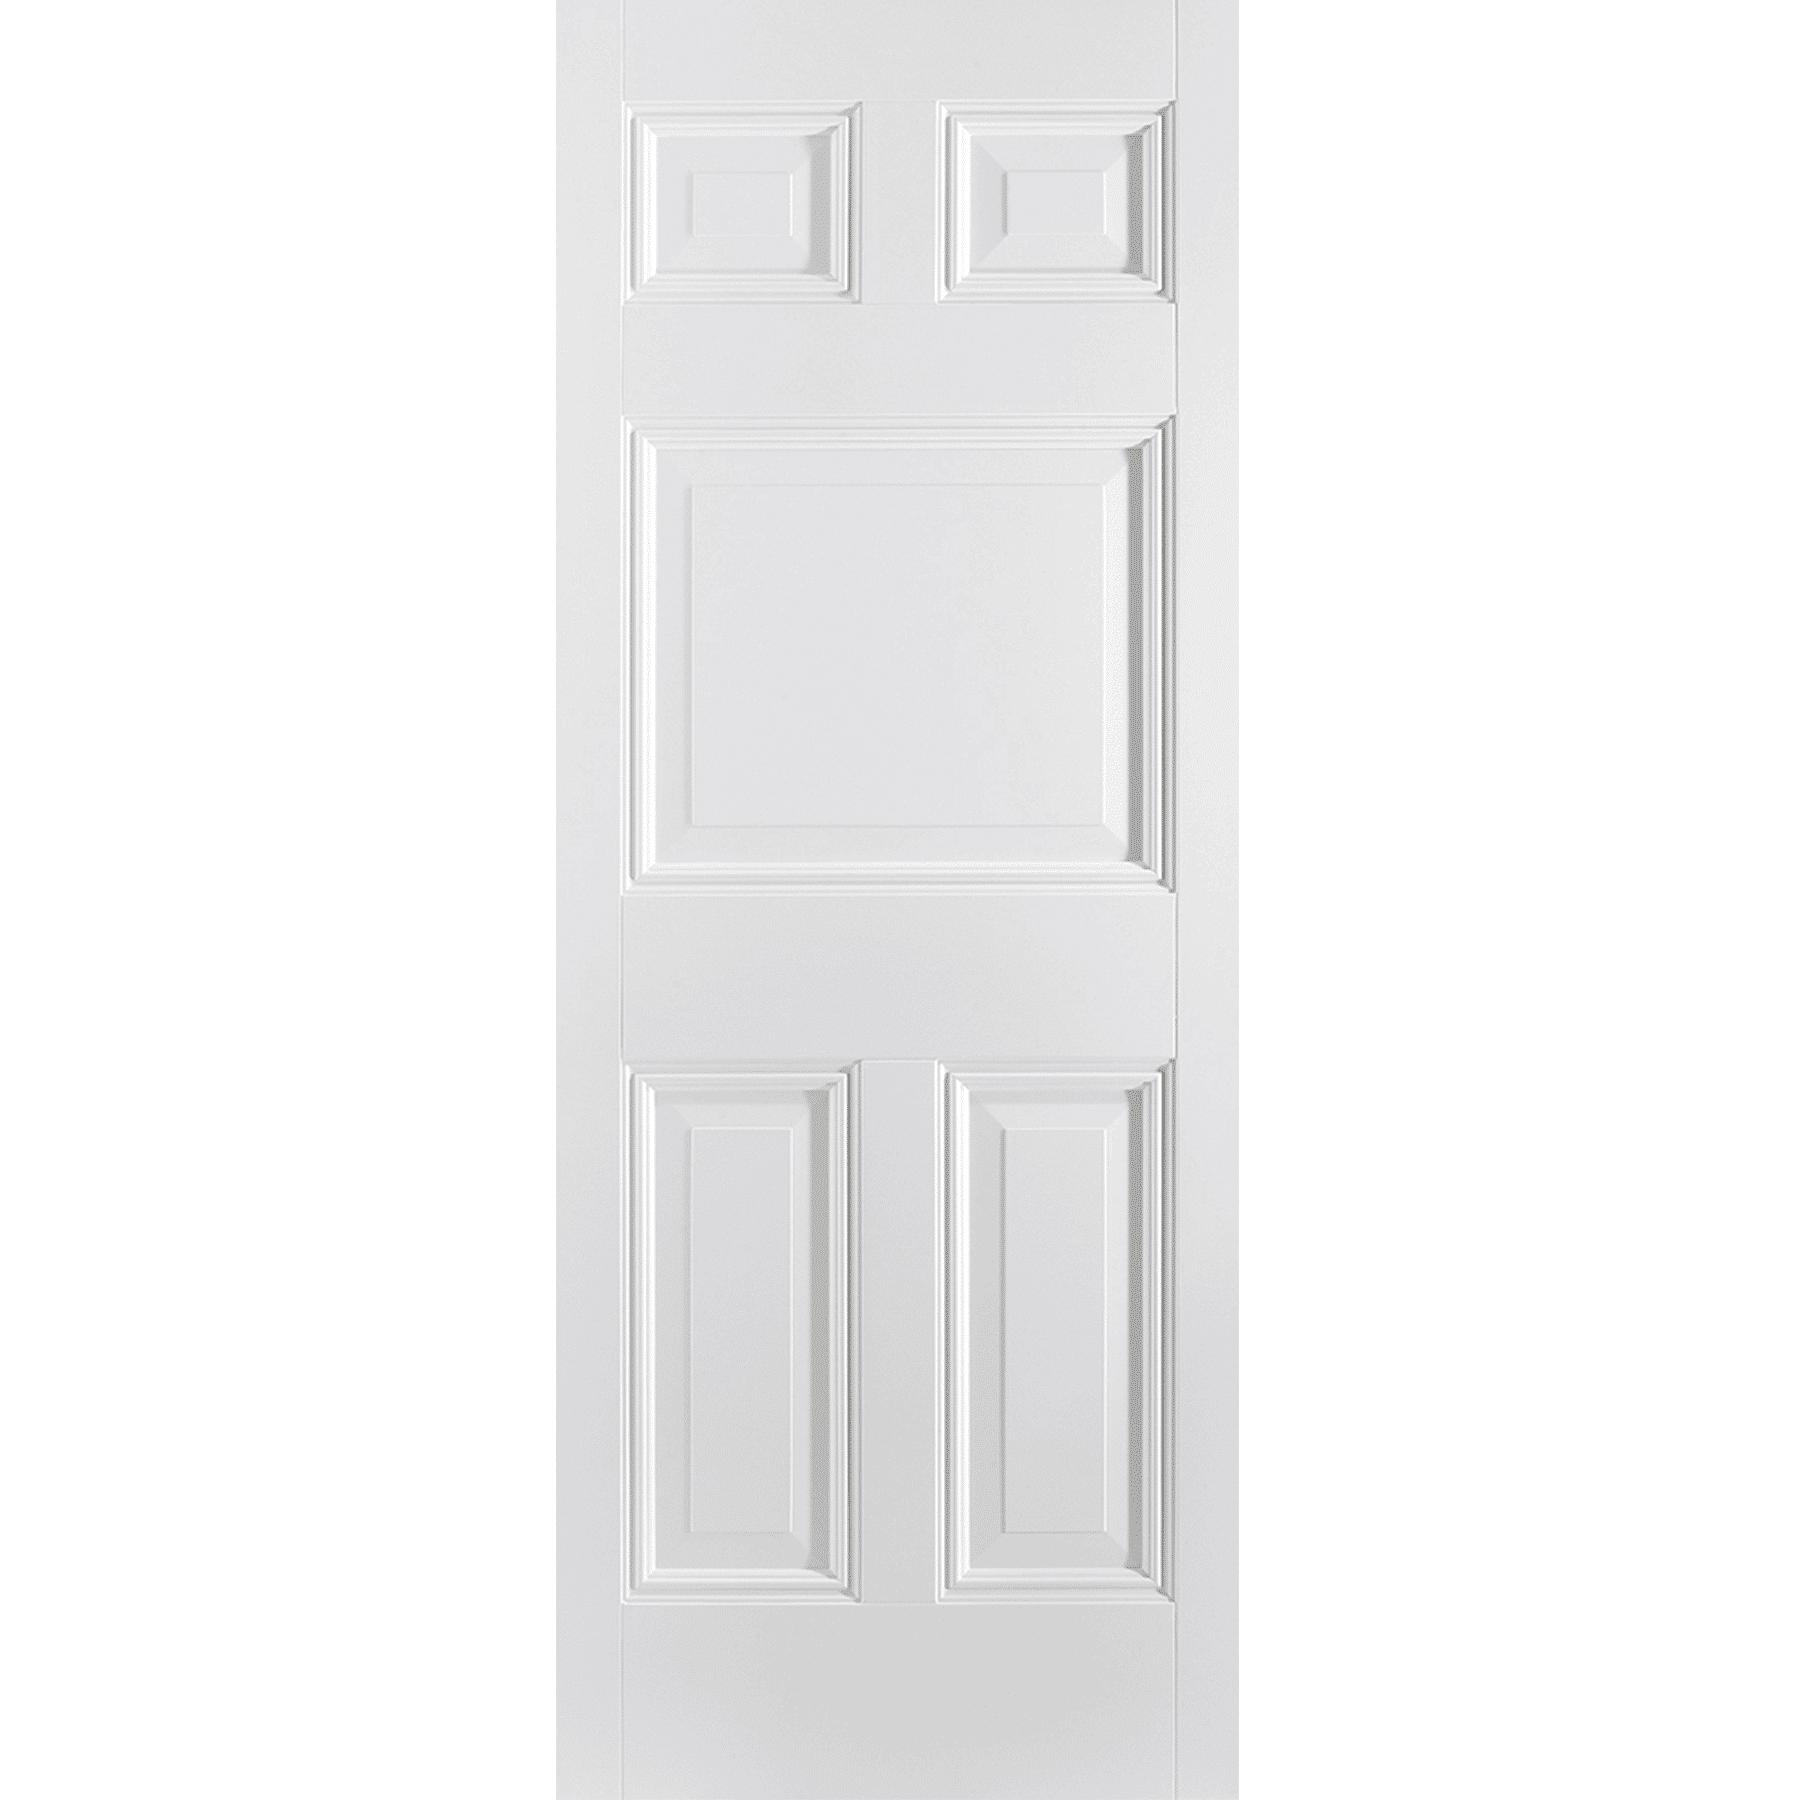 White Paris 5 Panel Internal Door